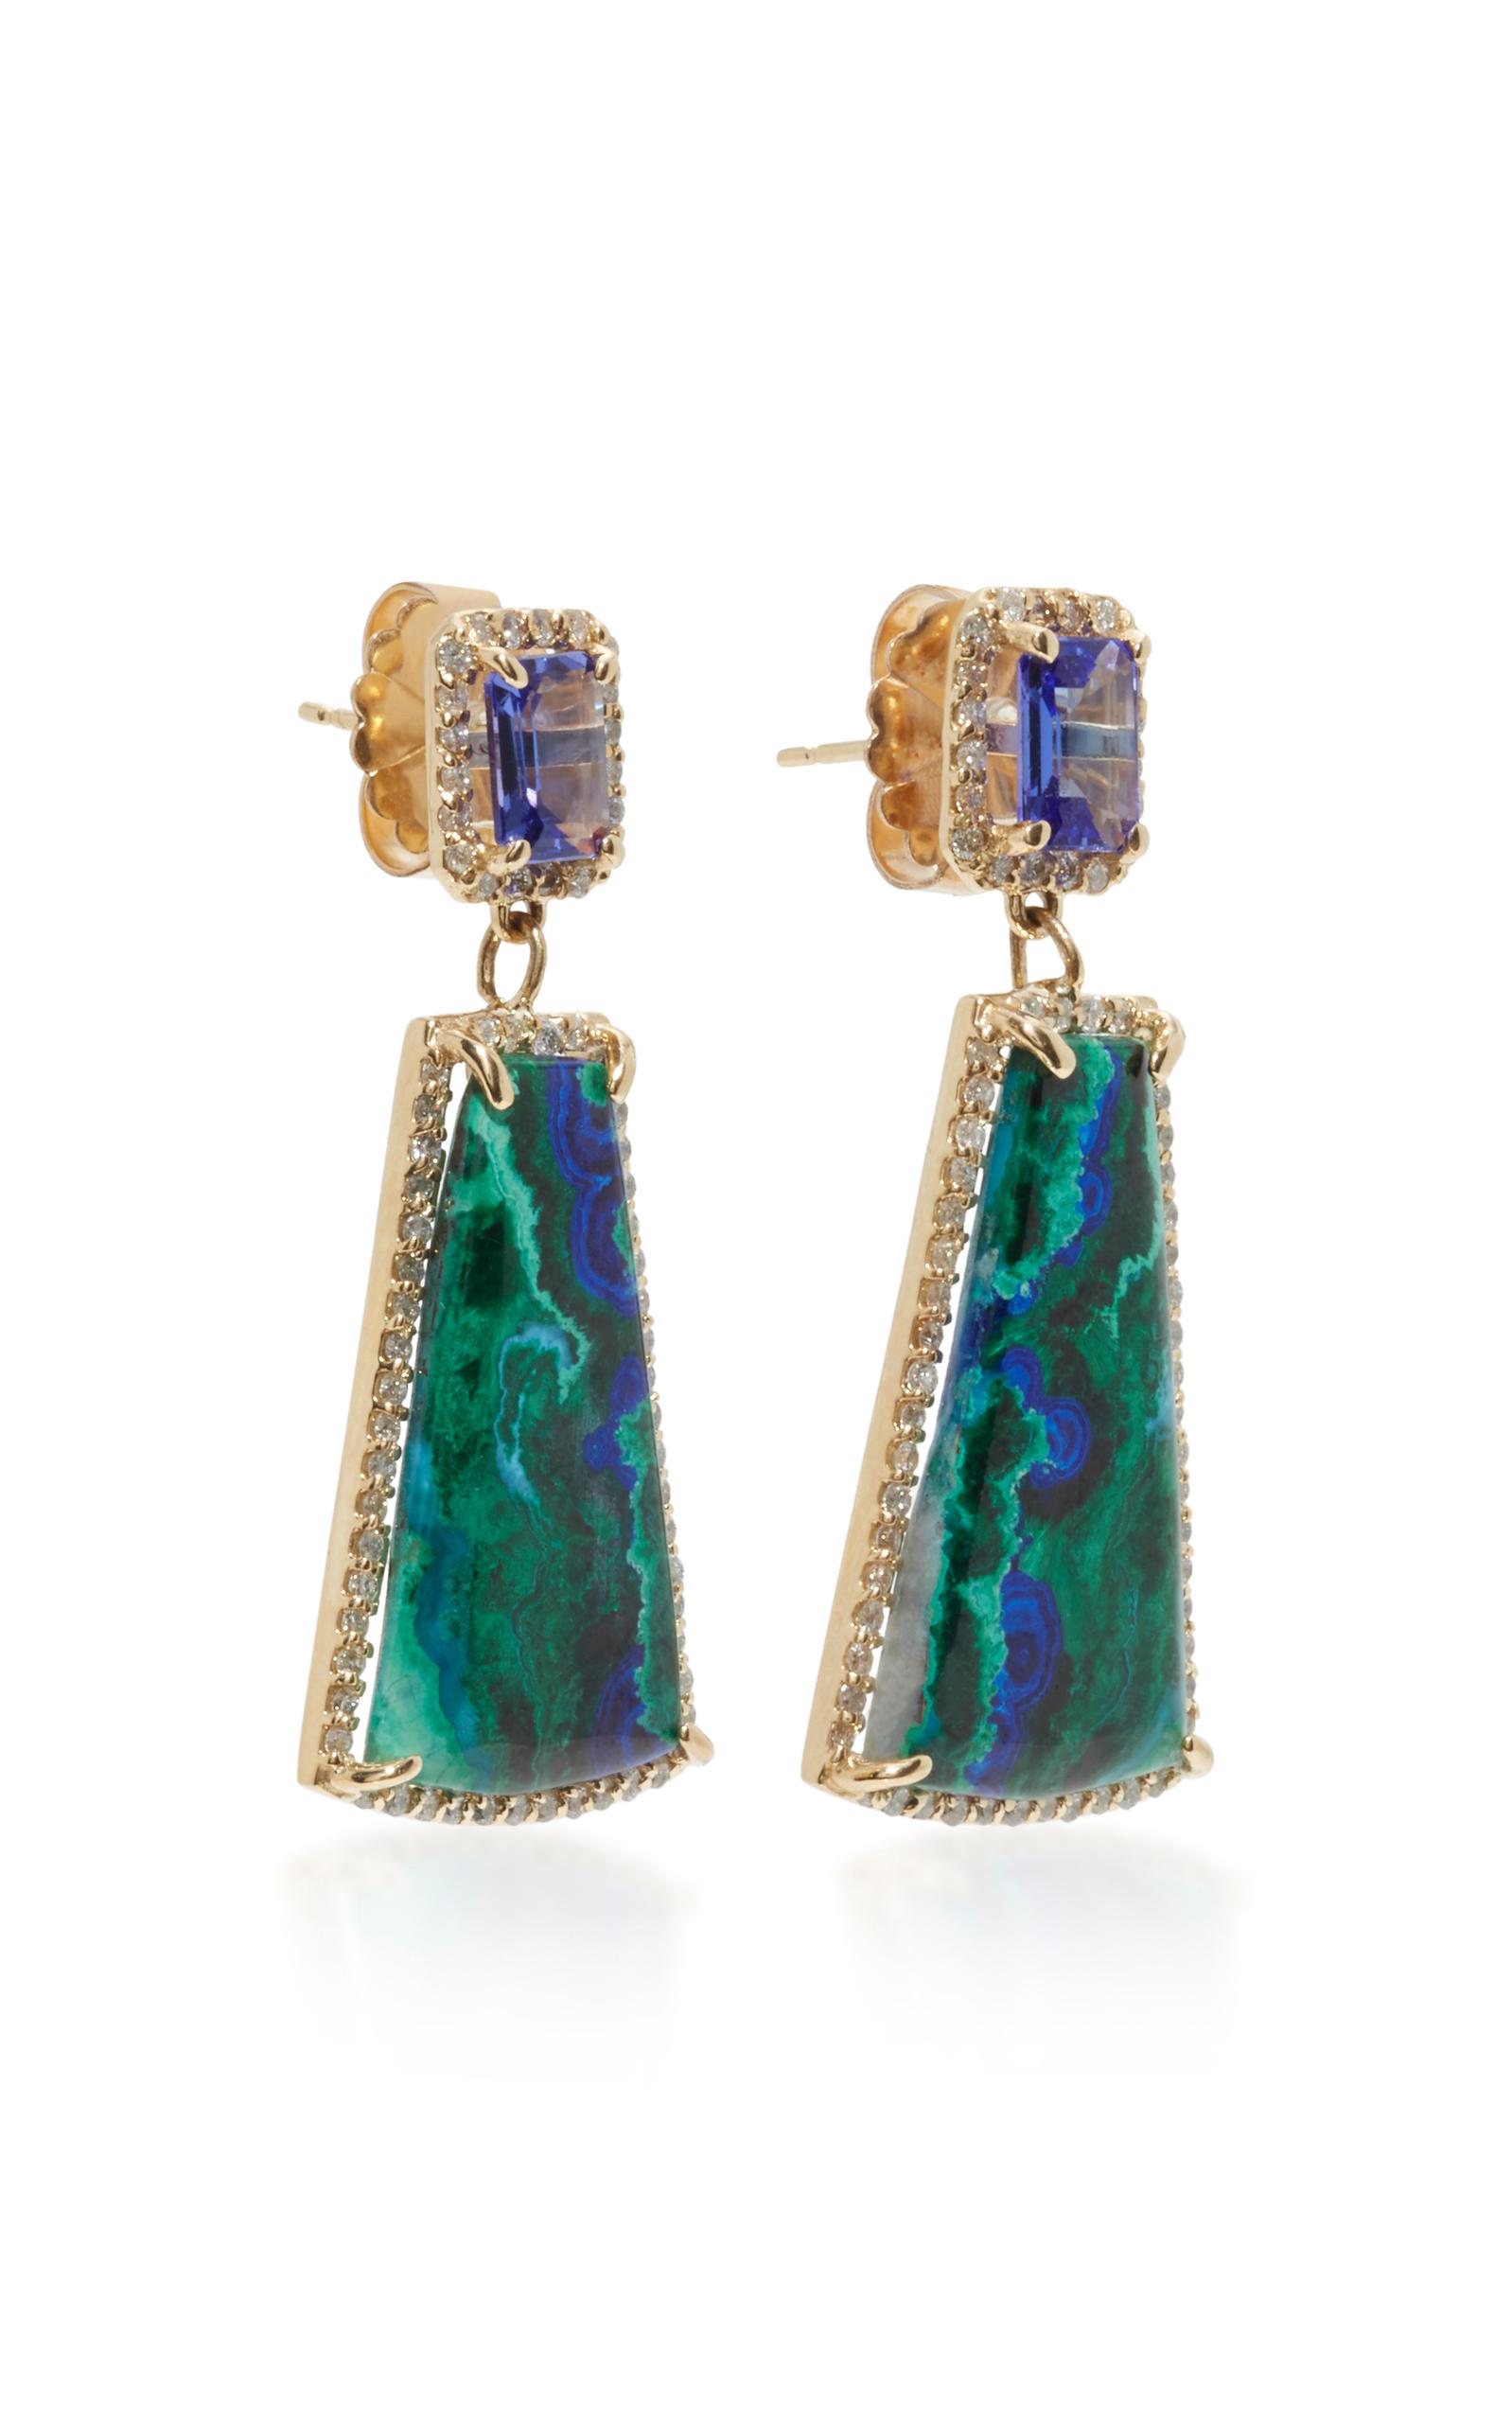 product diamond diamonds jewelersdavid david jewelers yg band tenenbaum webb with earrings